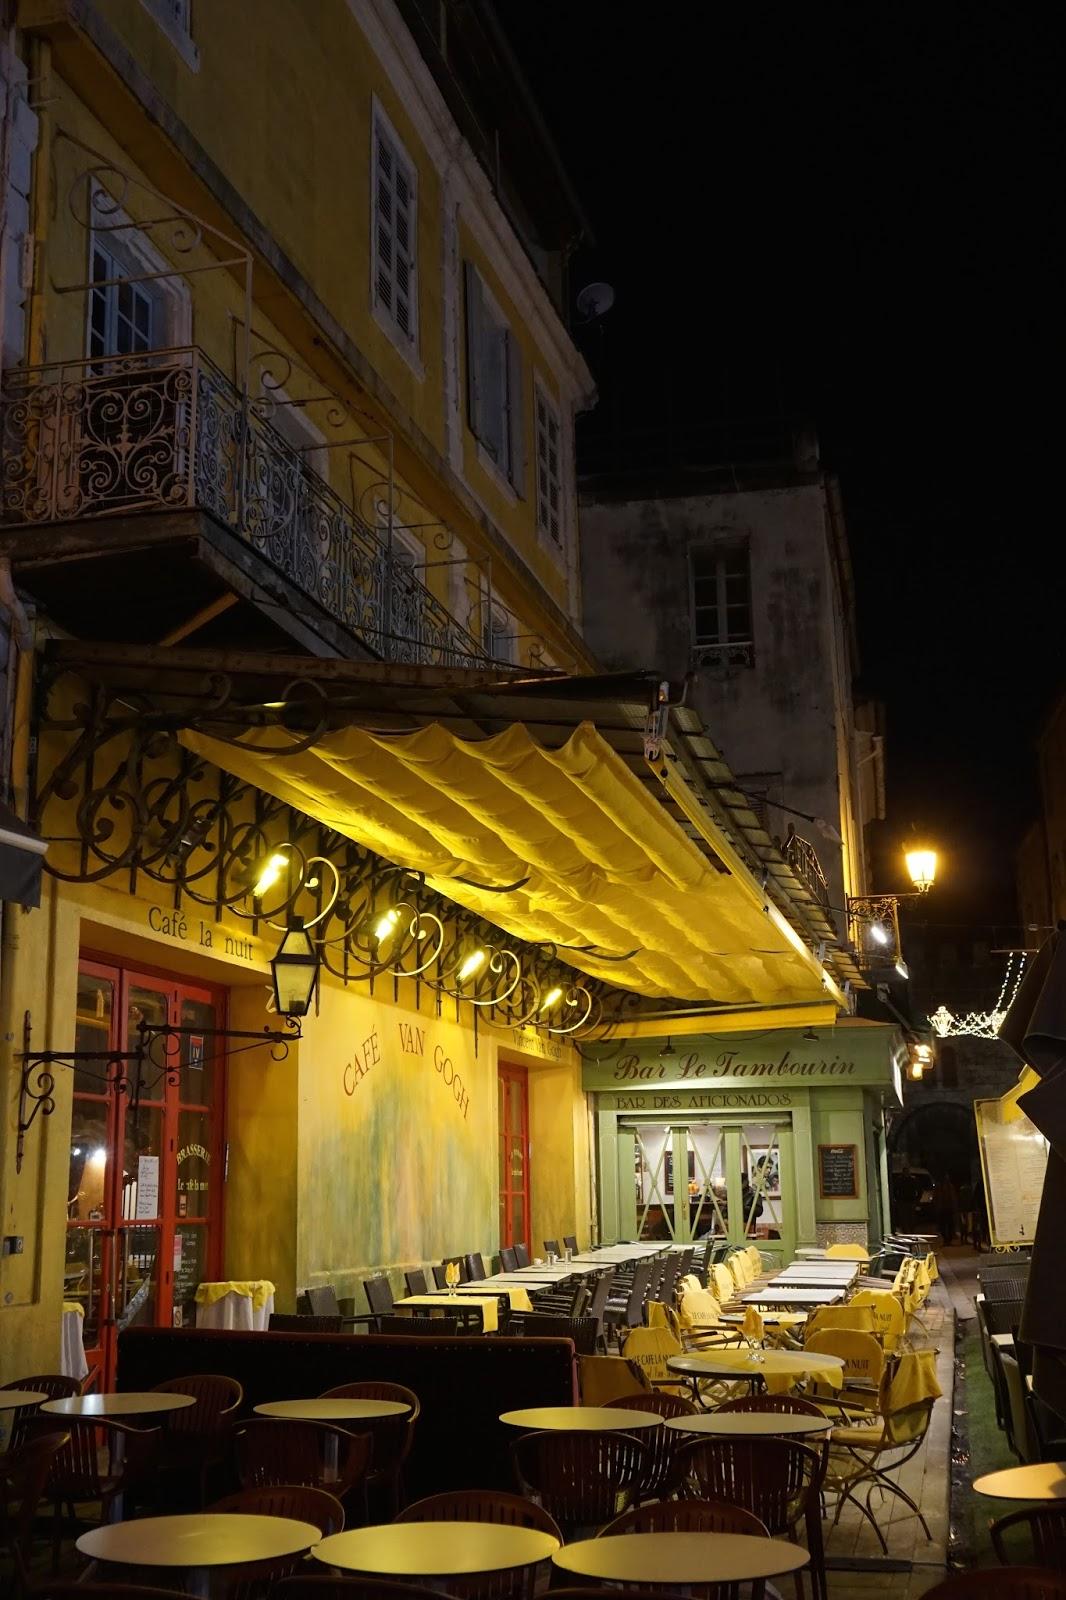 Van Gogh Cafe(夜のカフェテラス)